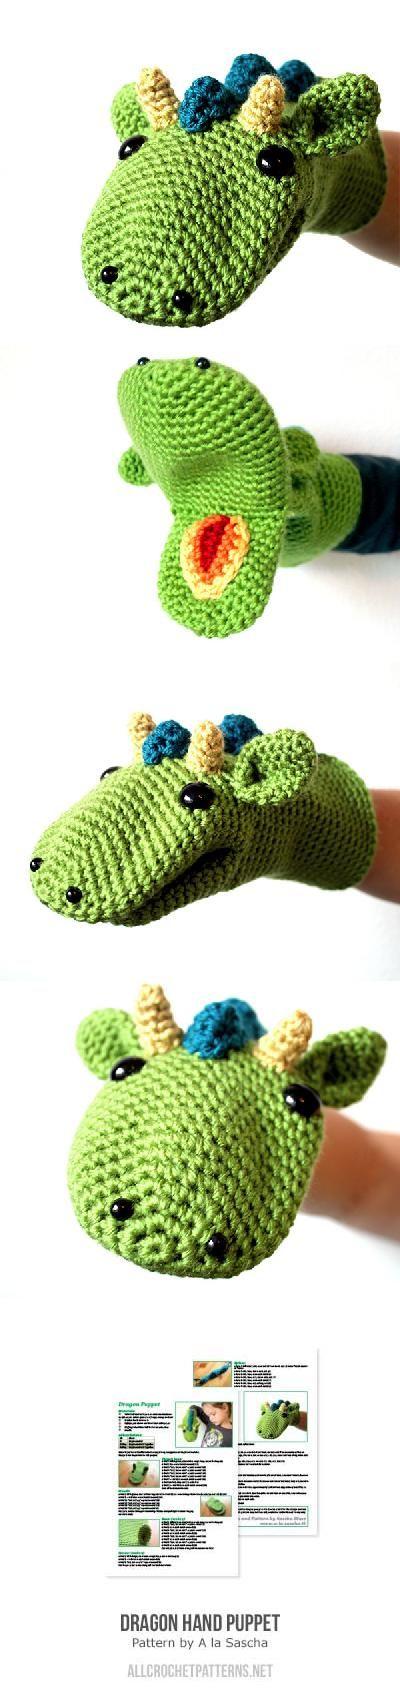 Dragon hand puppet crochet pattern by A la Sascha | amigurumi ...